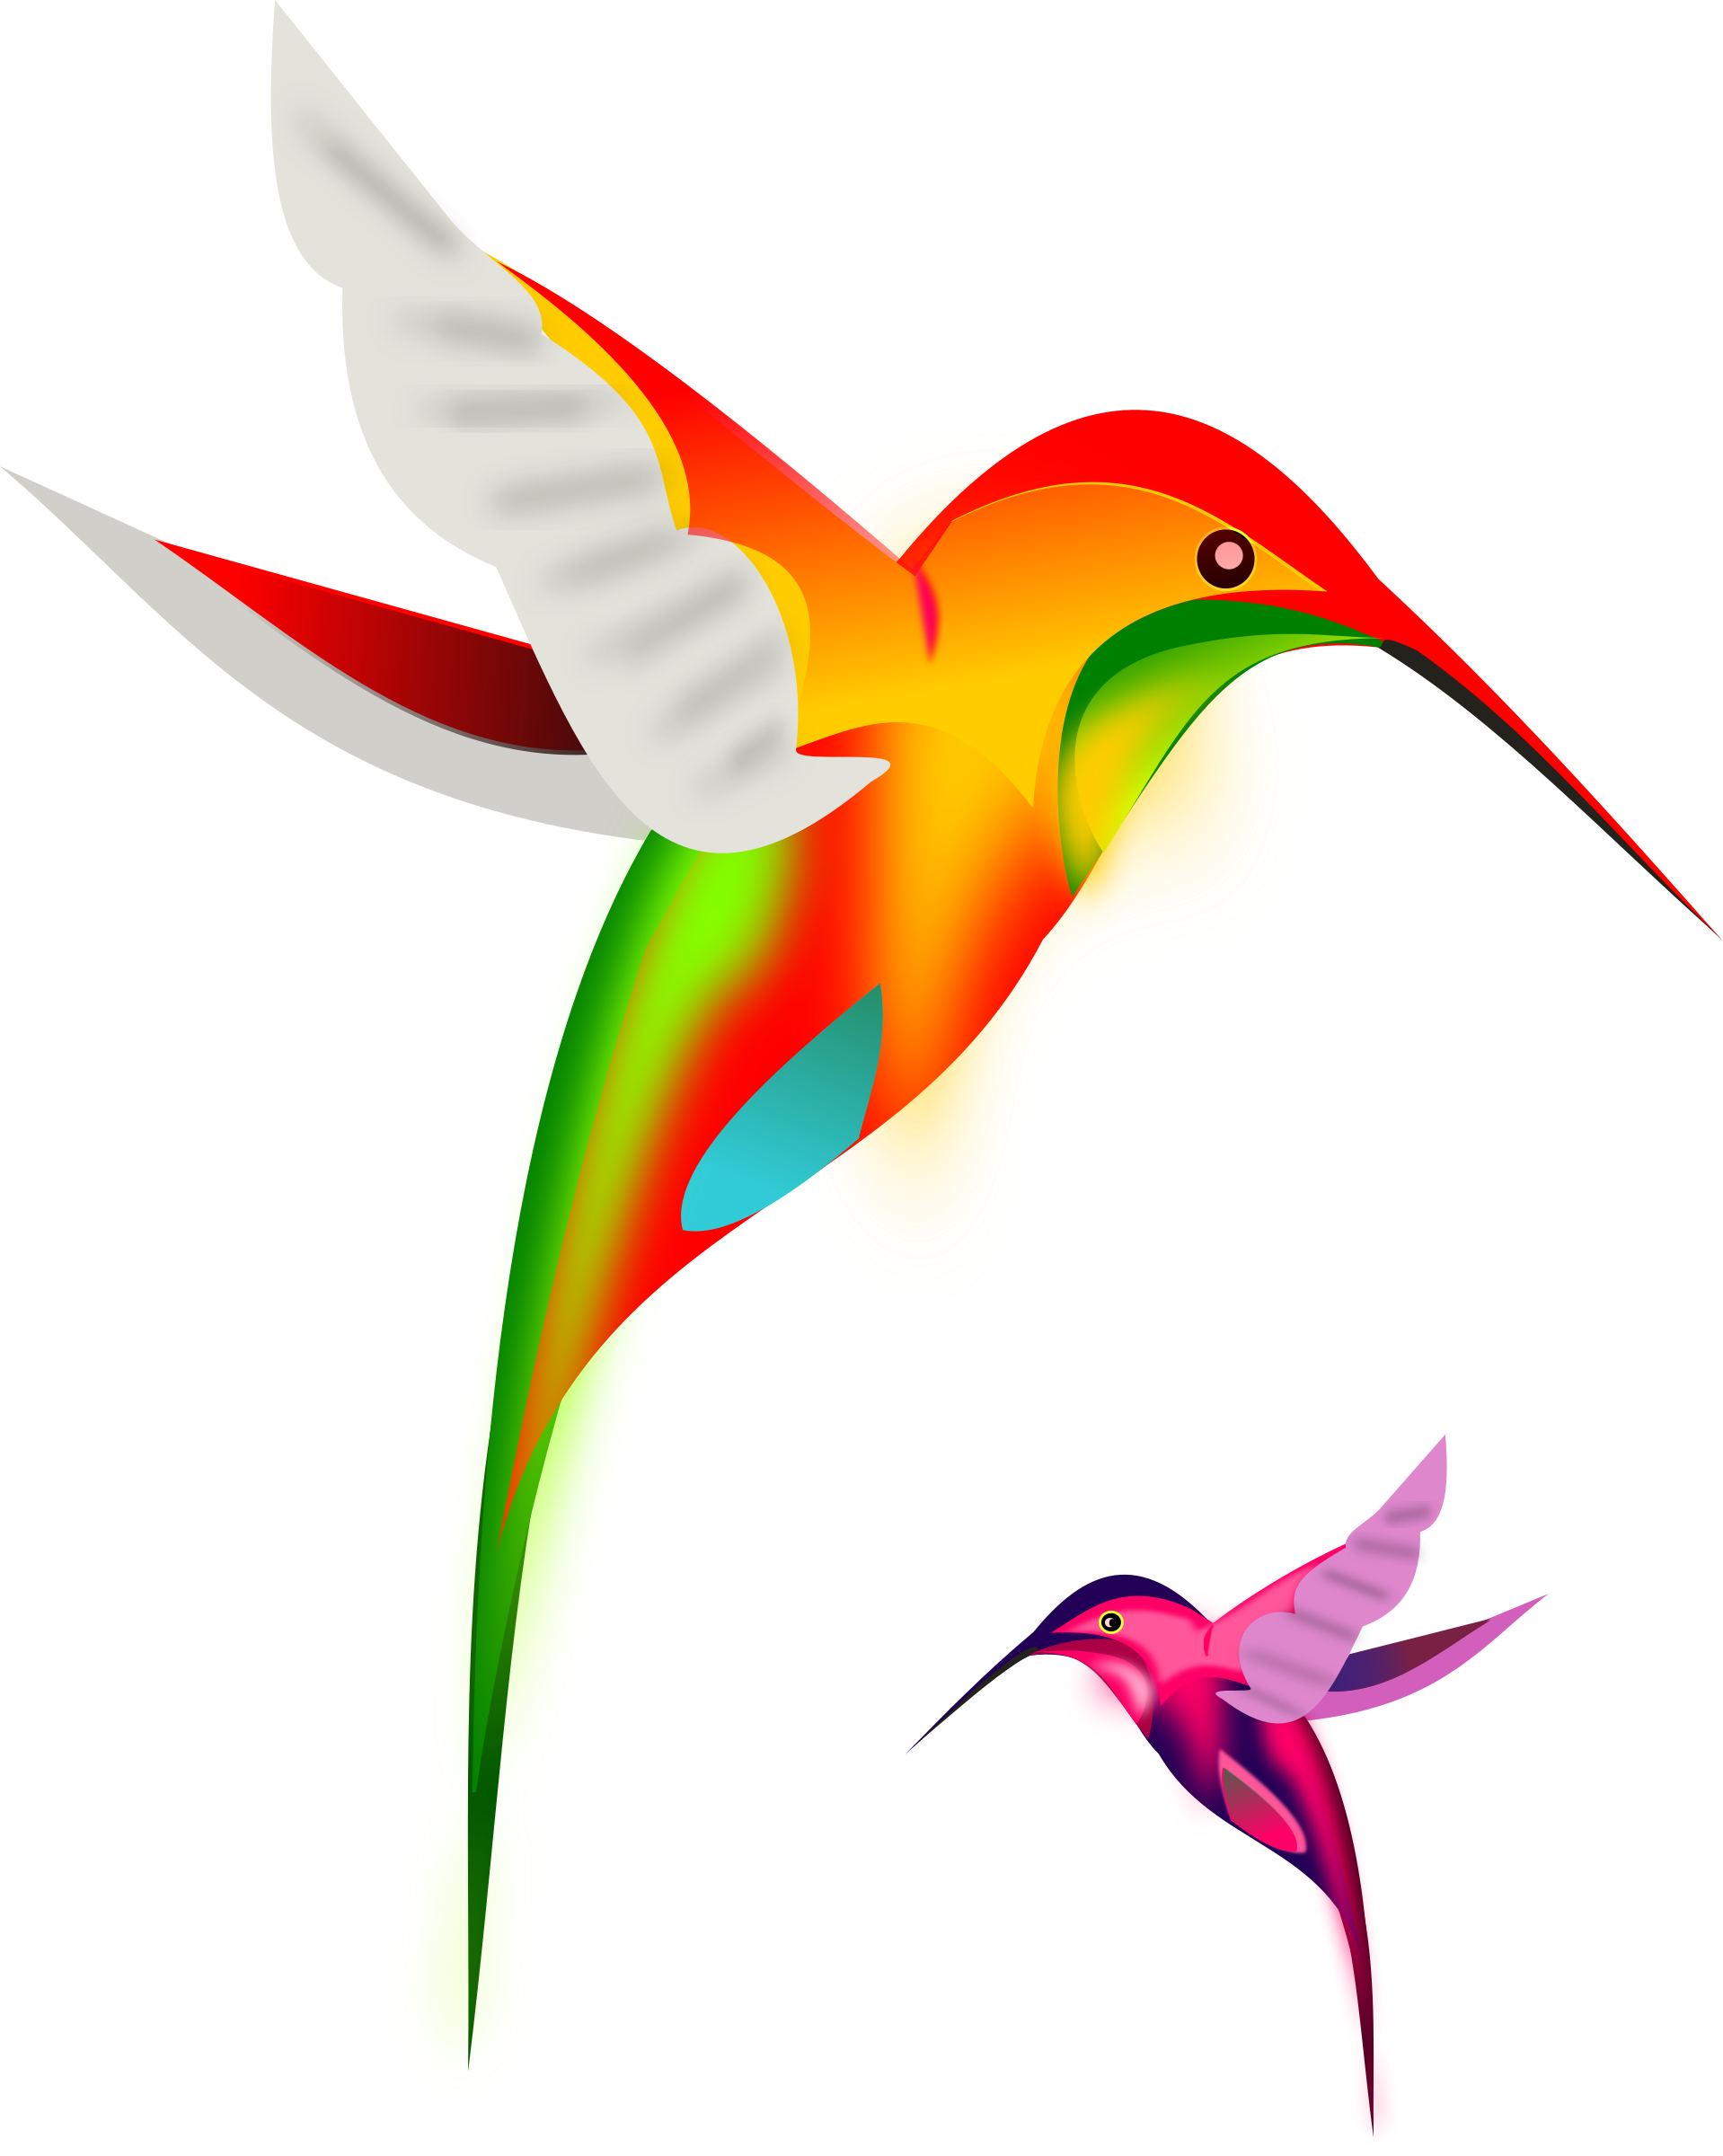 Hummingbird clipart flower tattoo. Colibri birds by gurica